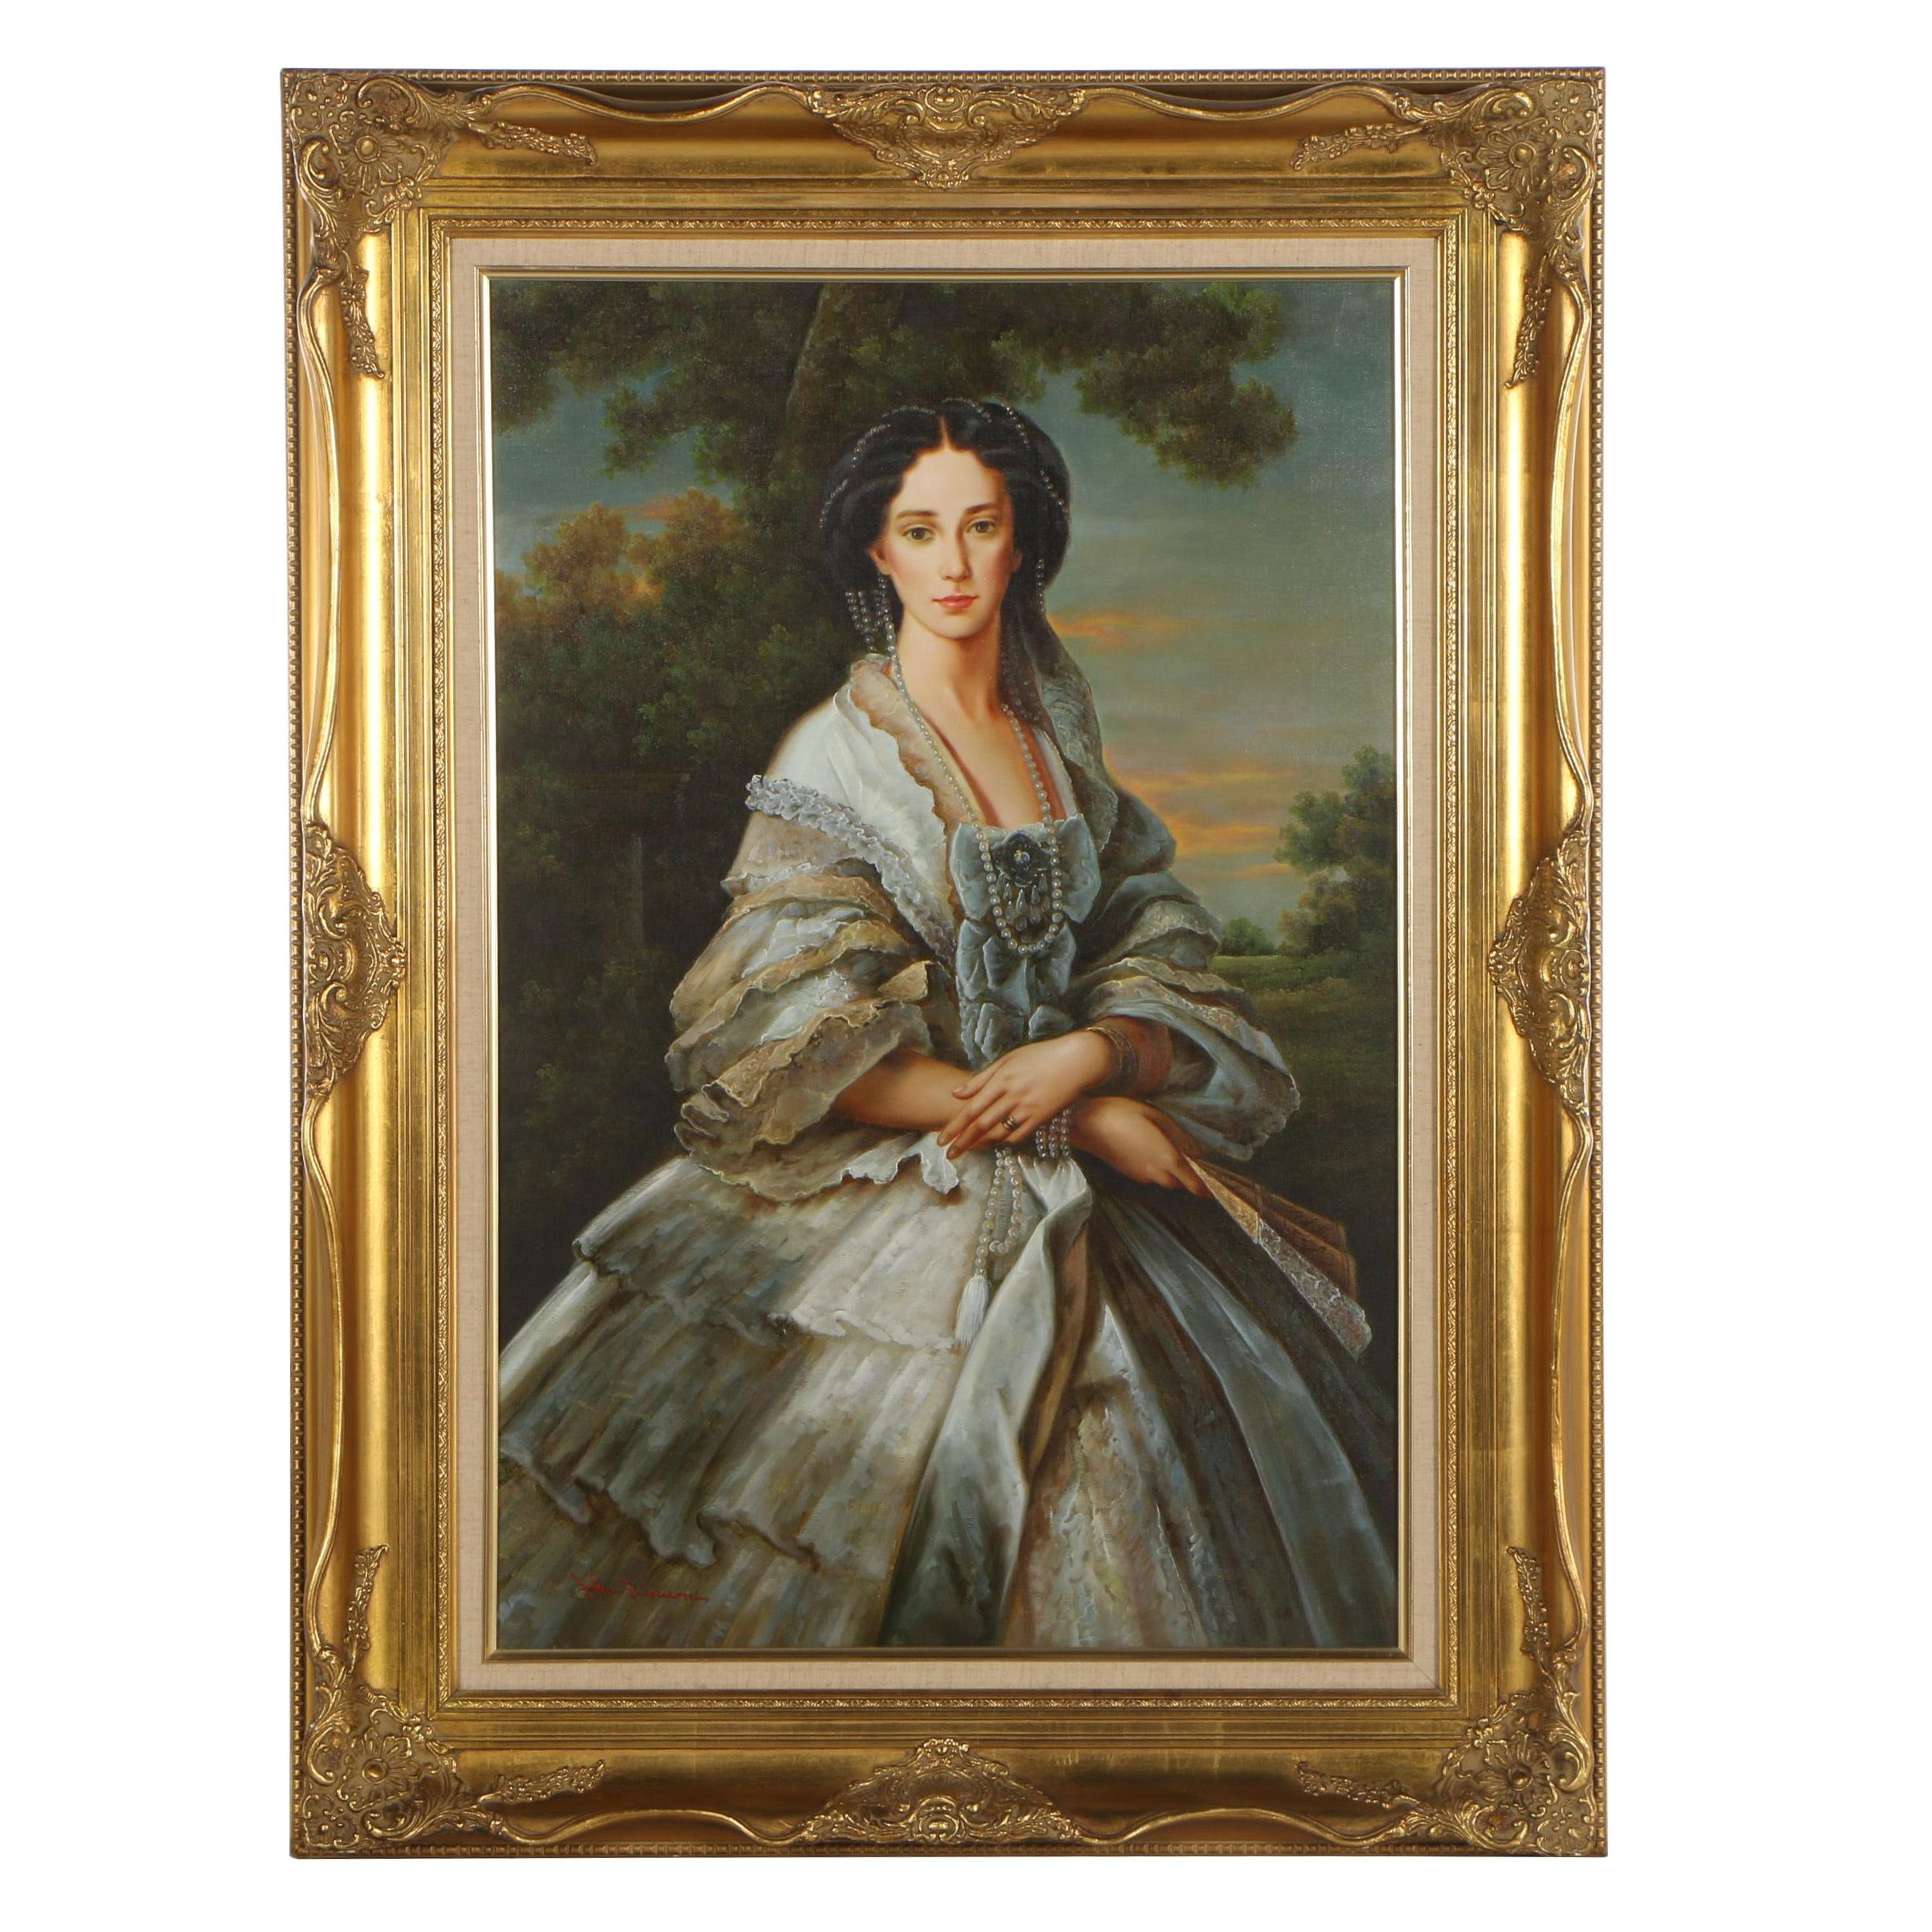 John Dawson Copy Oil Painting after Franz Xaver Winterhalter